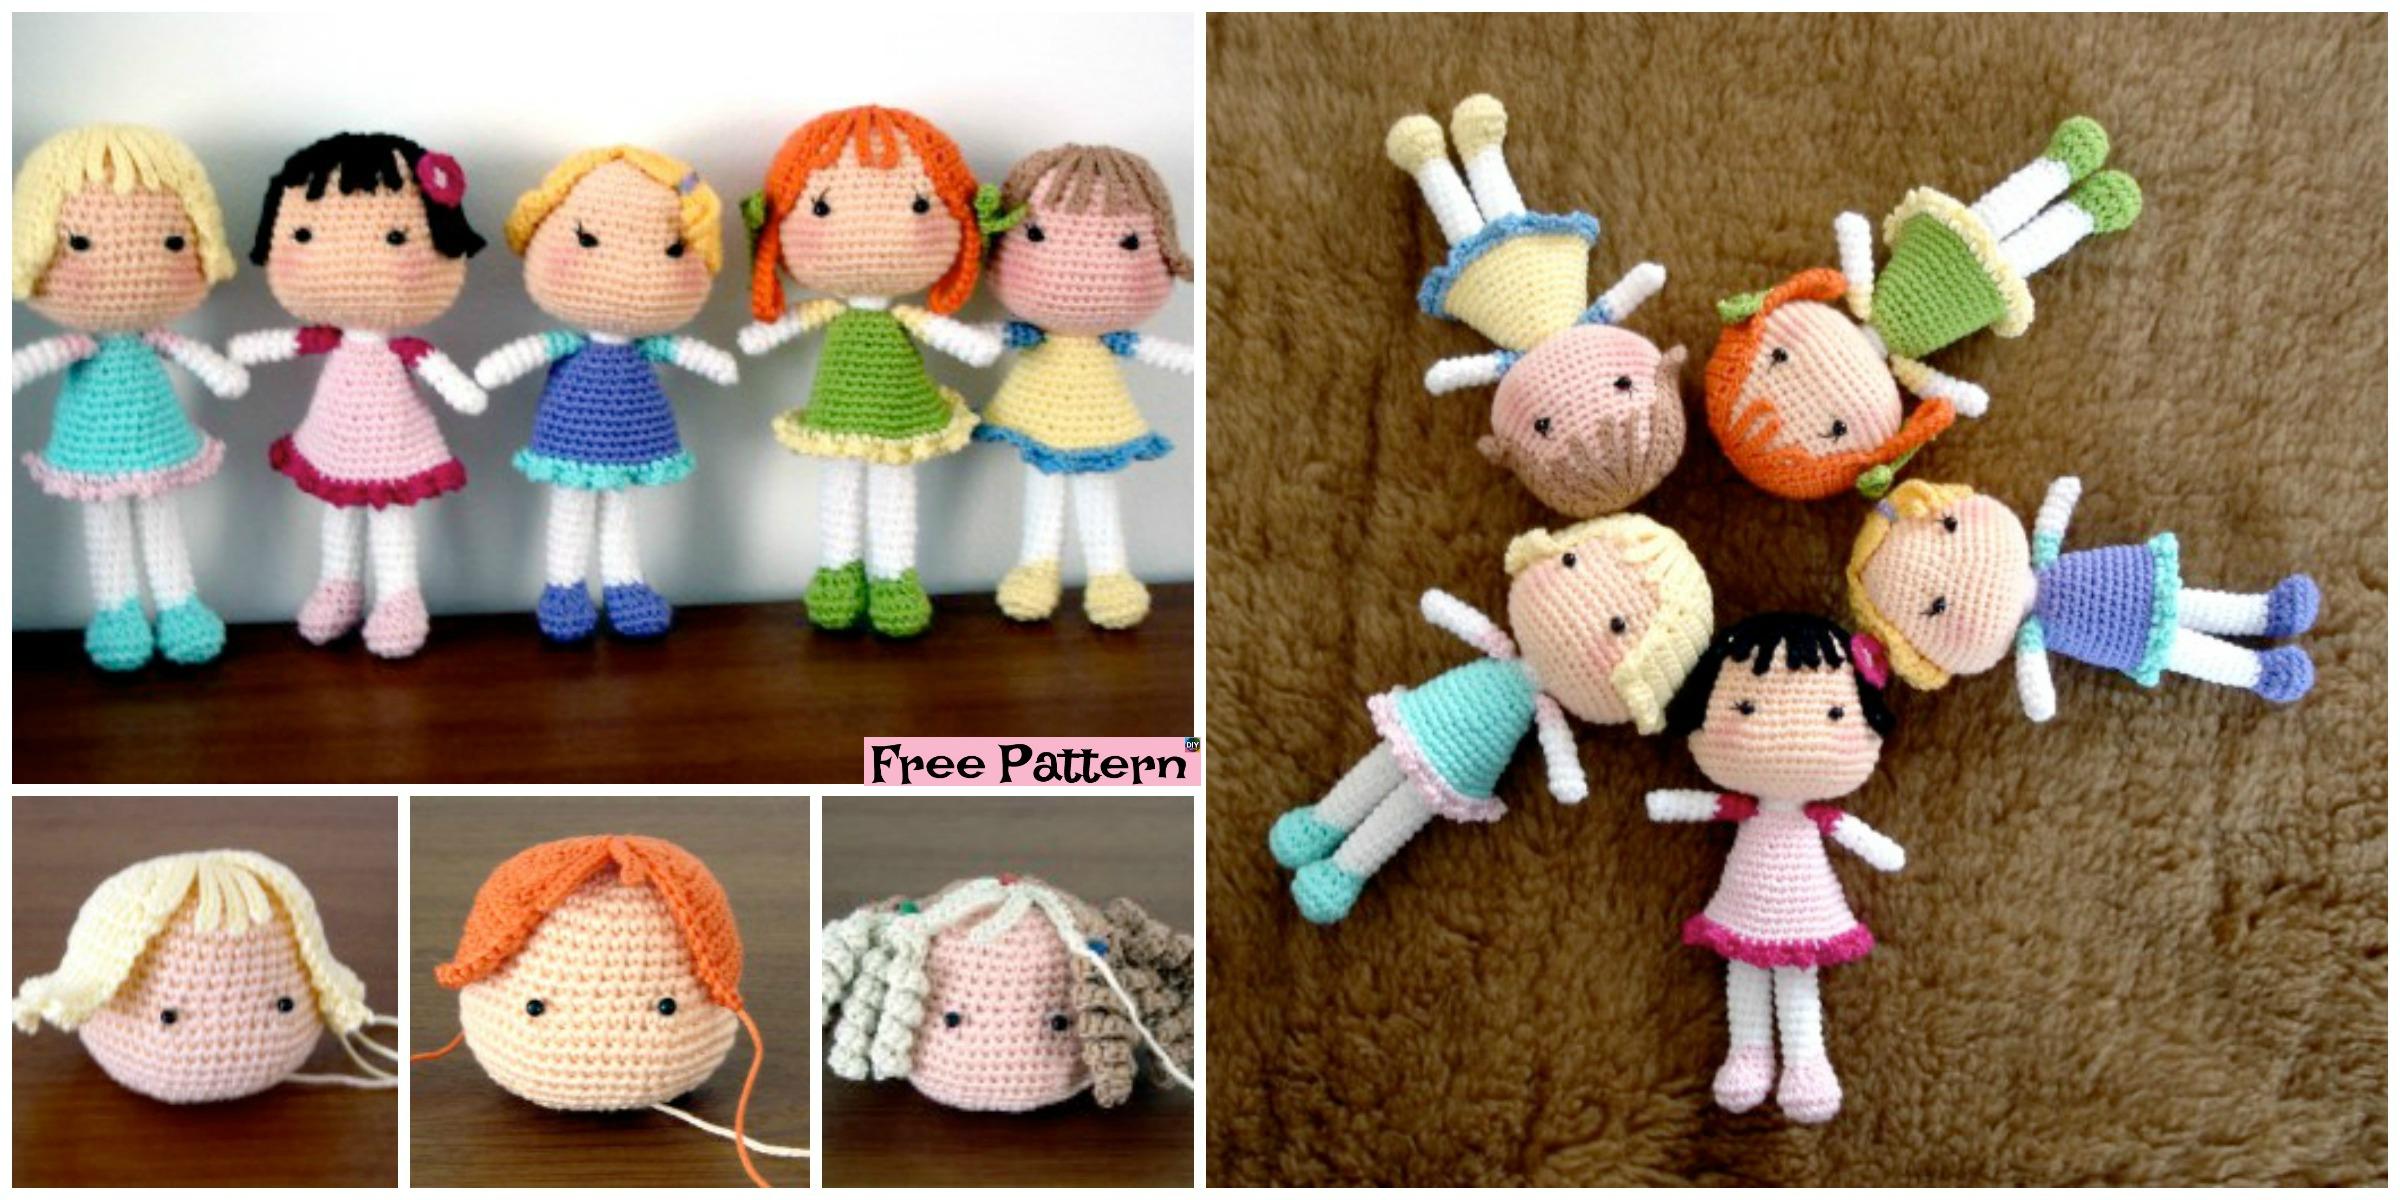 Amigurumi Crochet Doll Kit: Thora - Folksy | 1200x2400